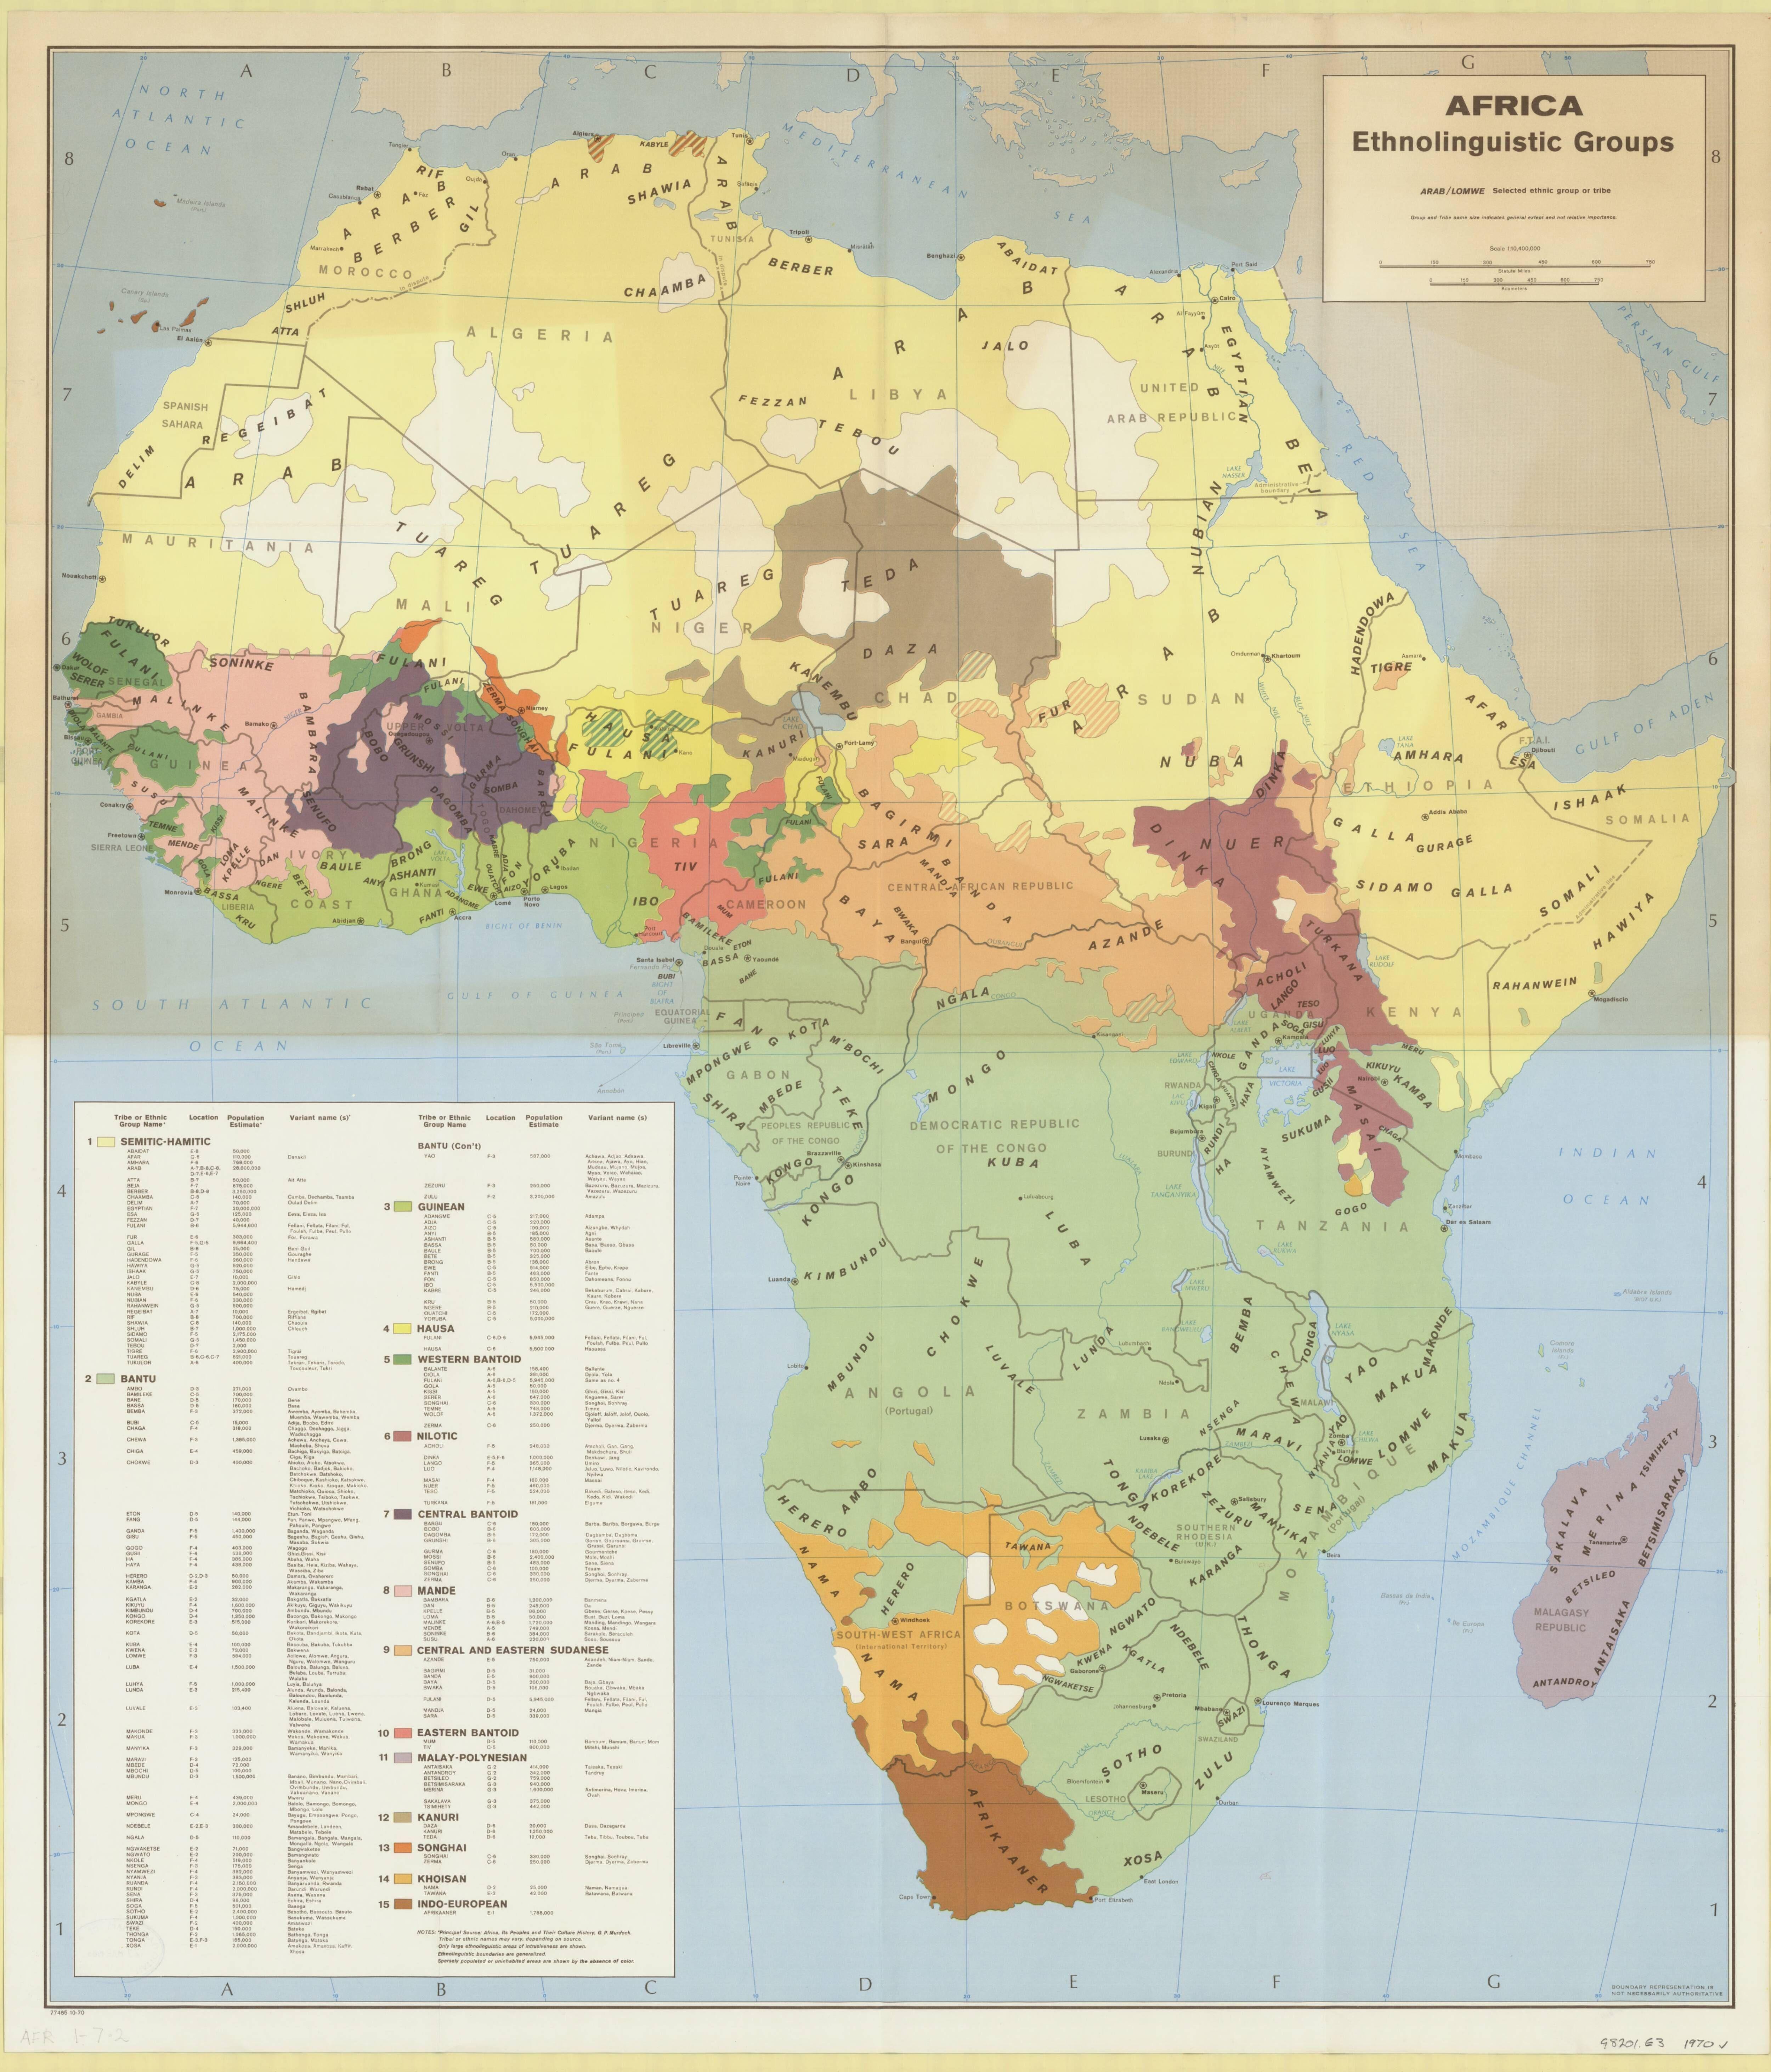 Ethnolinguistic groups of Africa, 1970 | Africa L | Africa map